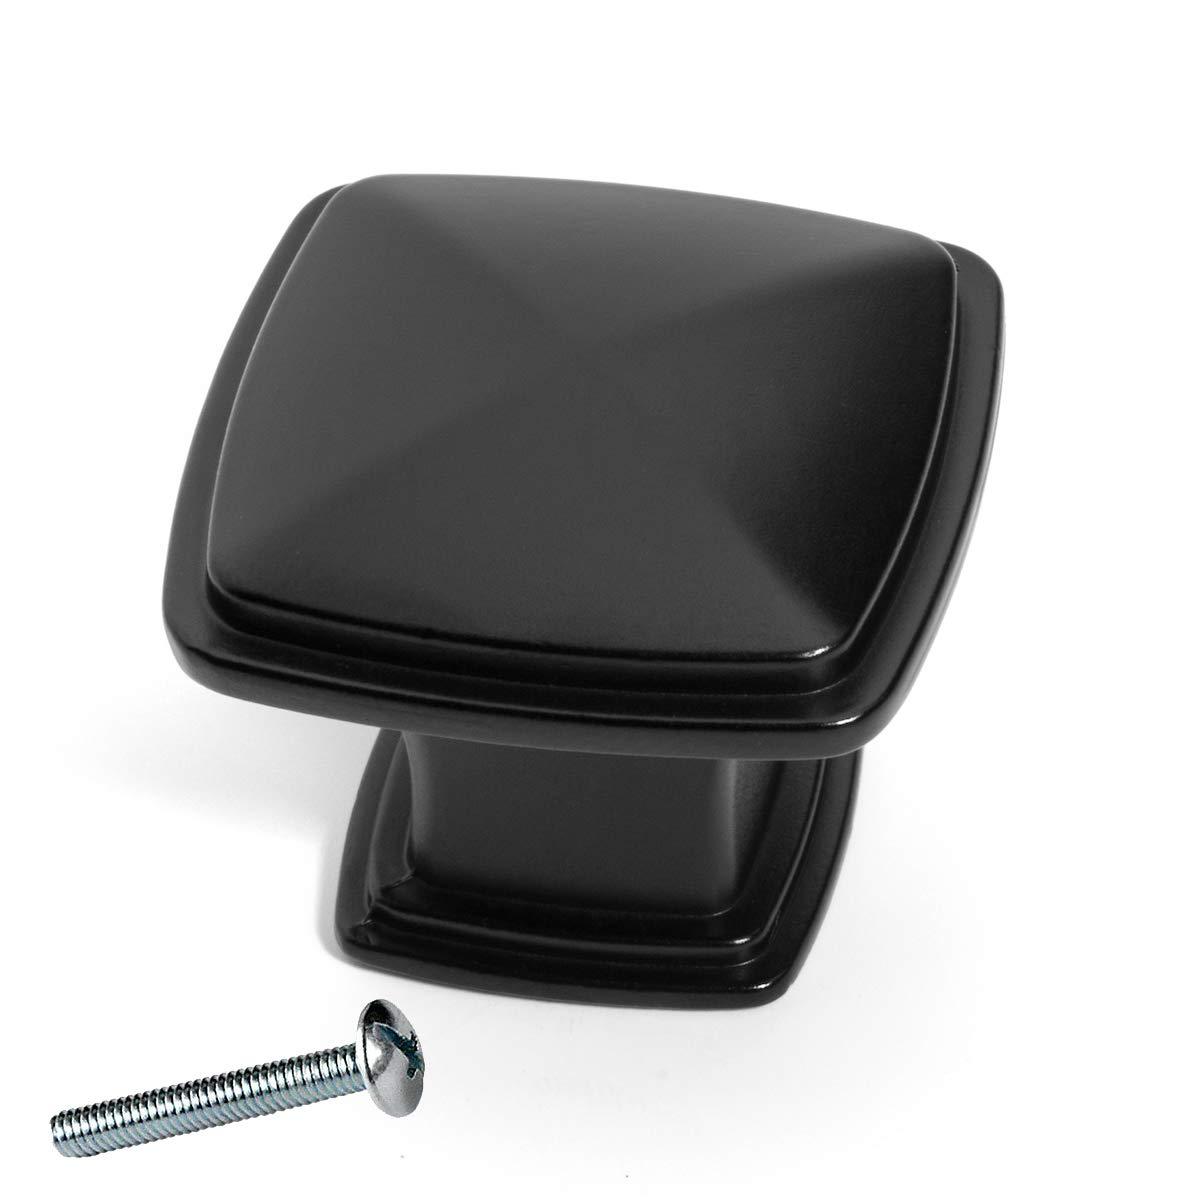 Flat Black Dynasty Hardware K-81091-FB-25PK Cabinet Hardware 1-1//4-Inch Square Knob 25-Pack